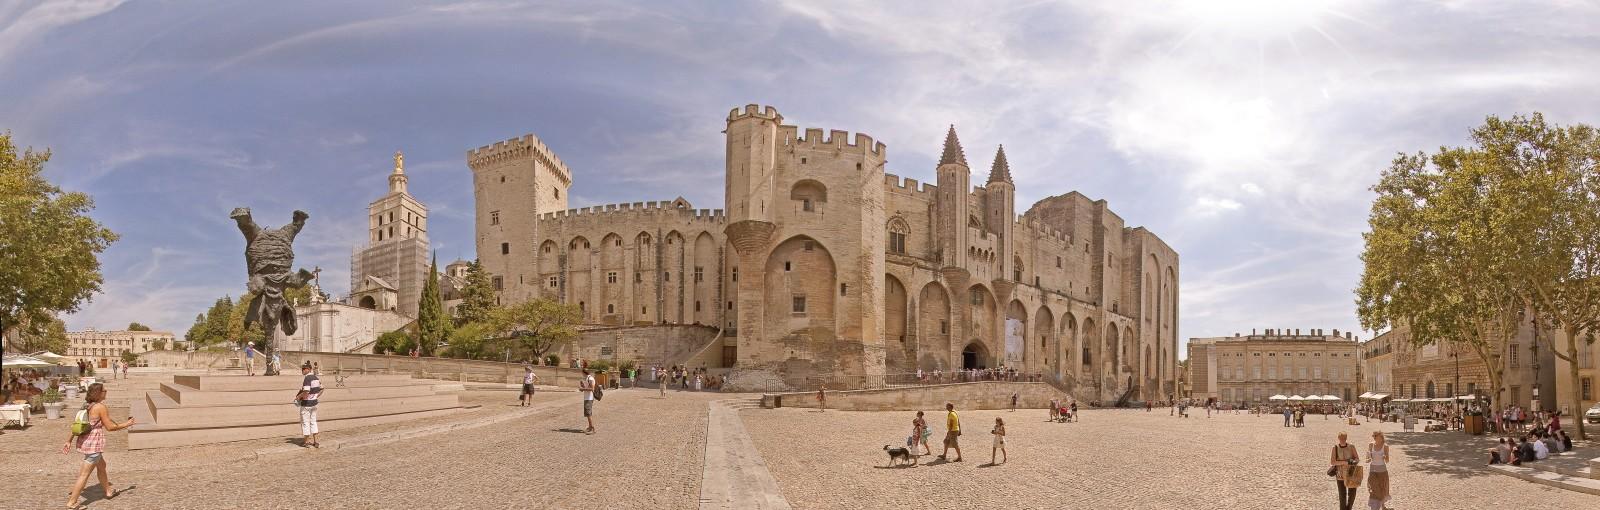 Tours Paris - Burgundy – Lyon - Provence – French Riviera - Multi-regional - Multiday tours from Paris